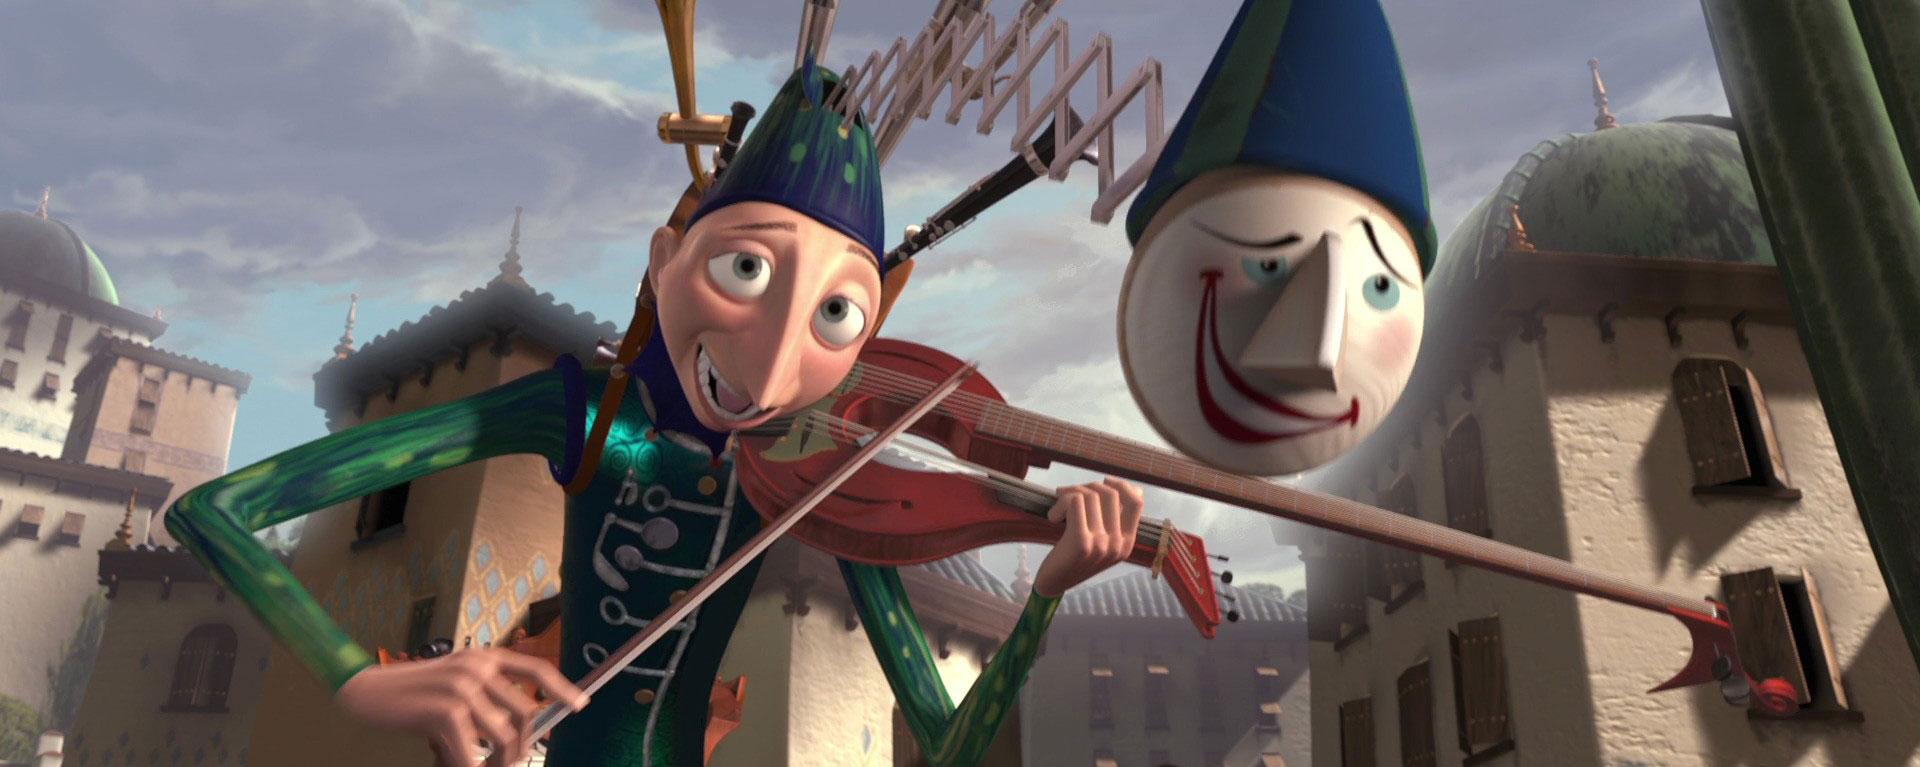 Pixar disney l'homme orchestre one man band